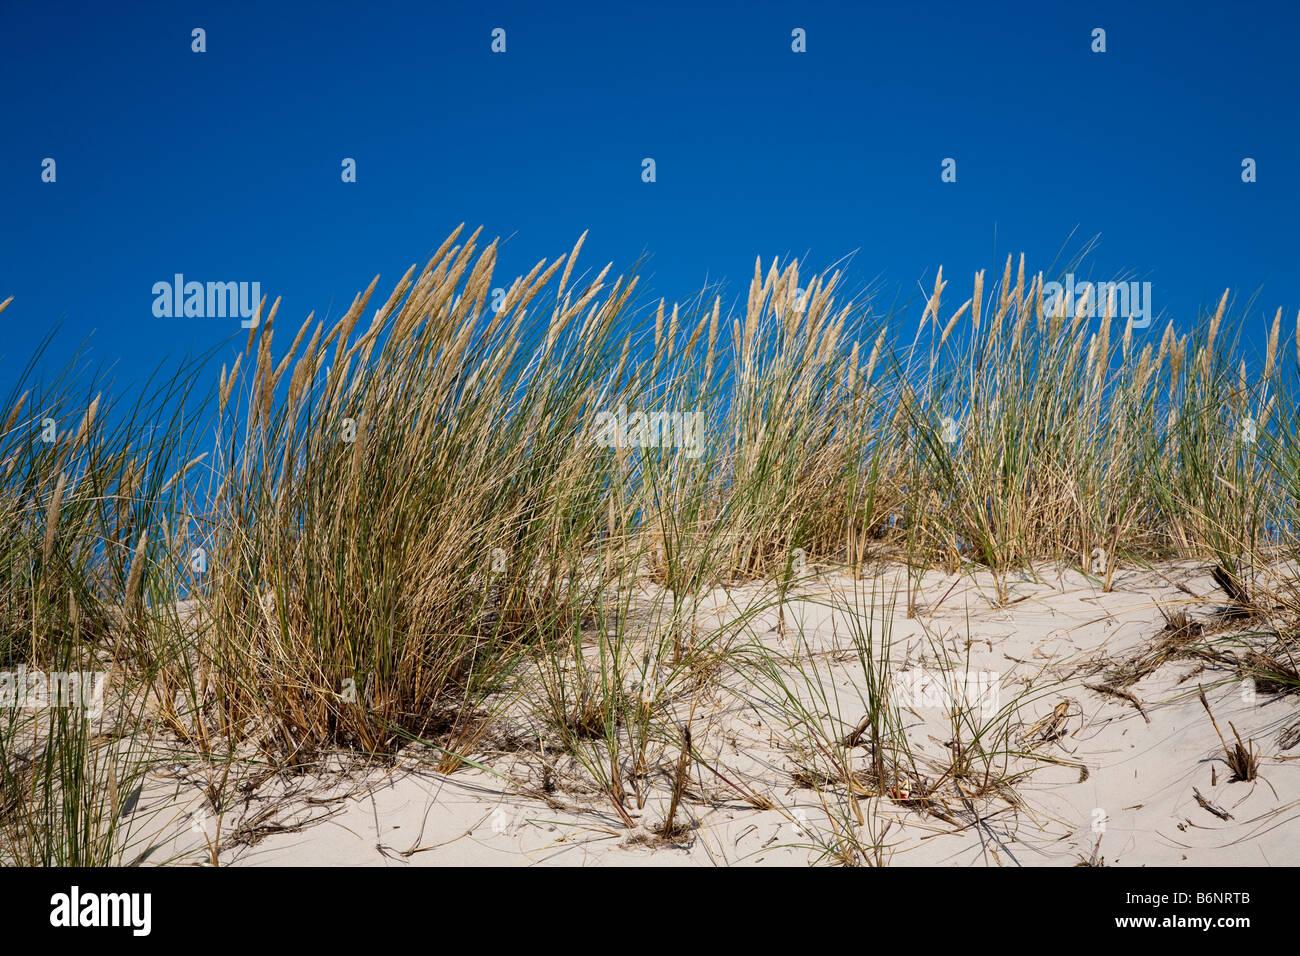 Marram grass Ammophilia arenaria preventing dune erosion in Lacka Gora dunes Slowinski national park Leba Poland - Stock Image